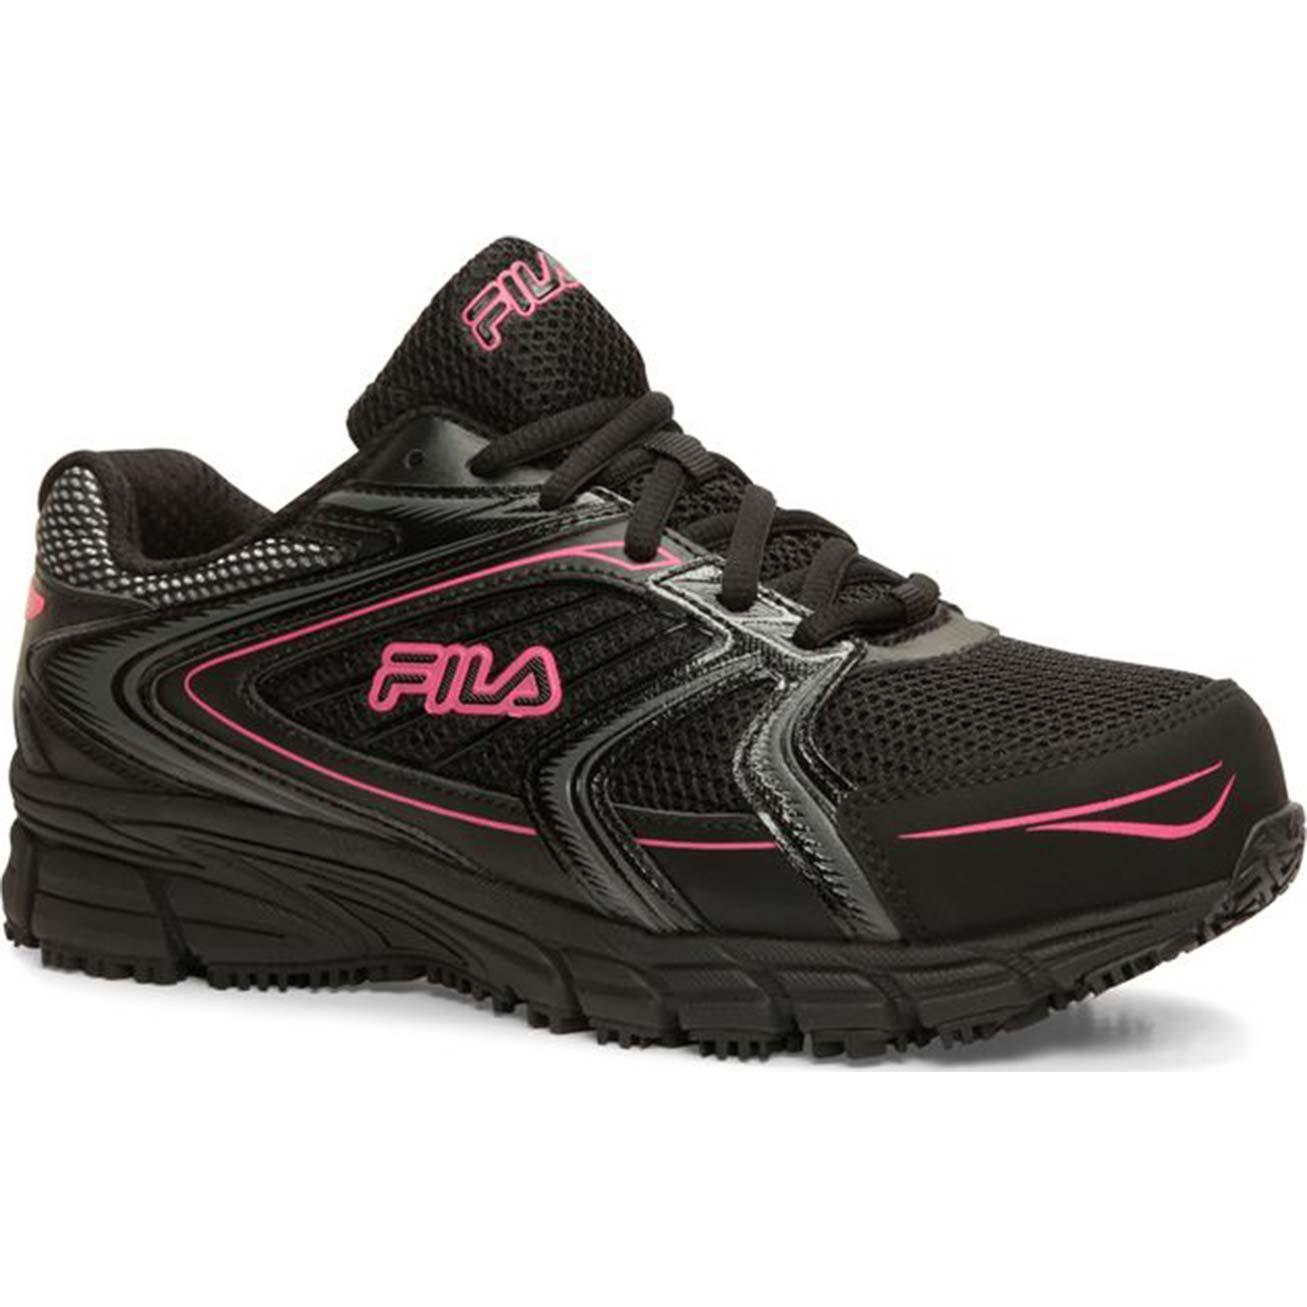 Fila Memory Reckoning 8 Women s Steel Toe Slip-Resistant Work Athletic  ShoeFila Memory Reckoning 8 Women s Steel Toe Slip-Resistant Work Athletic  Shoe 4a42314139